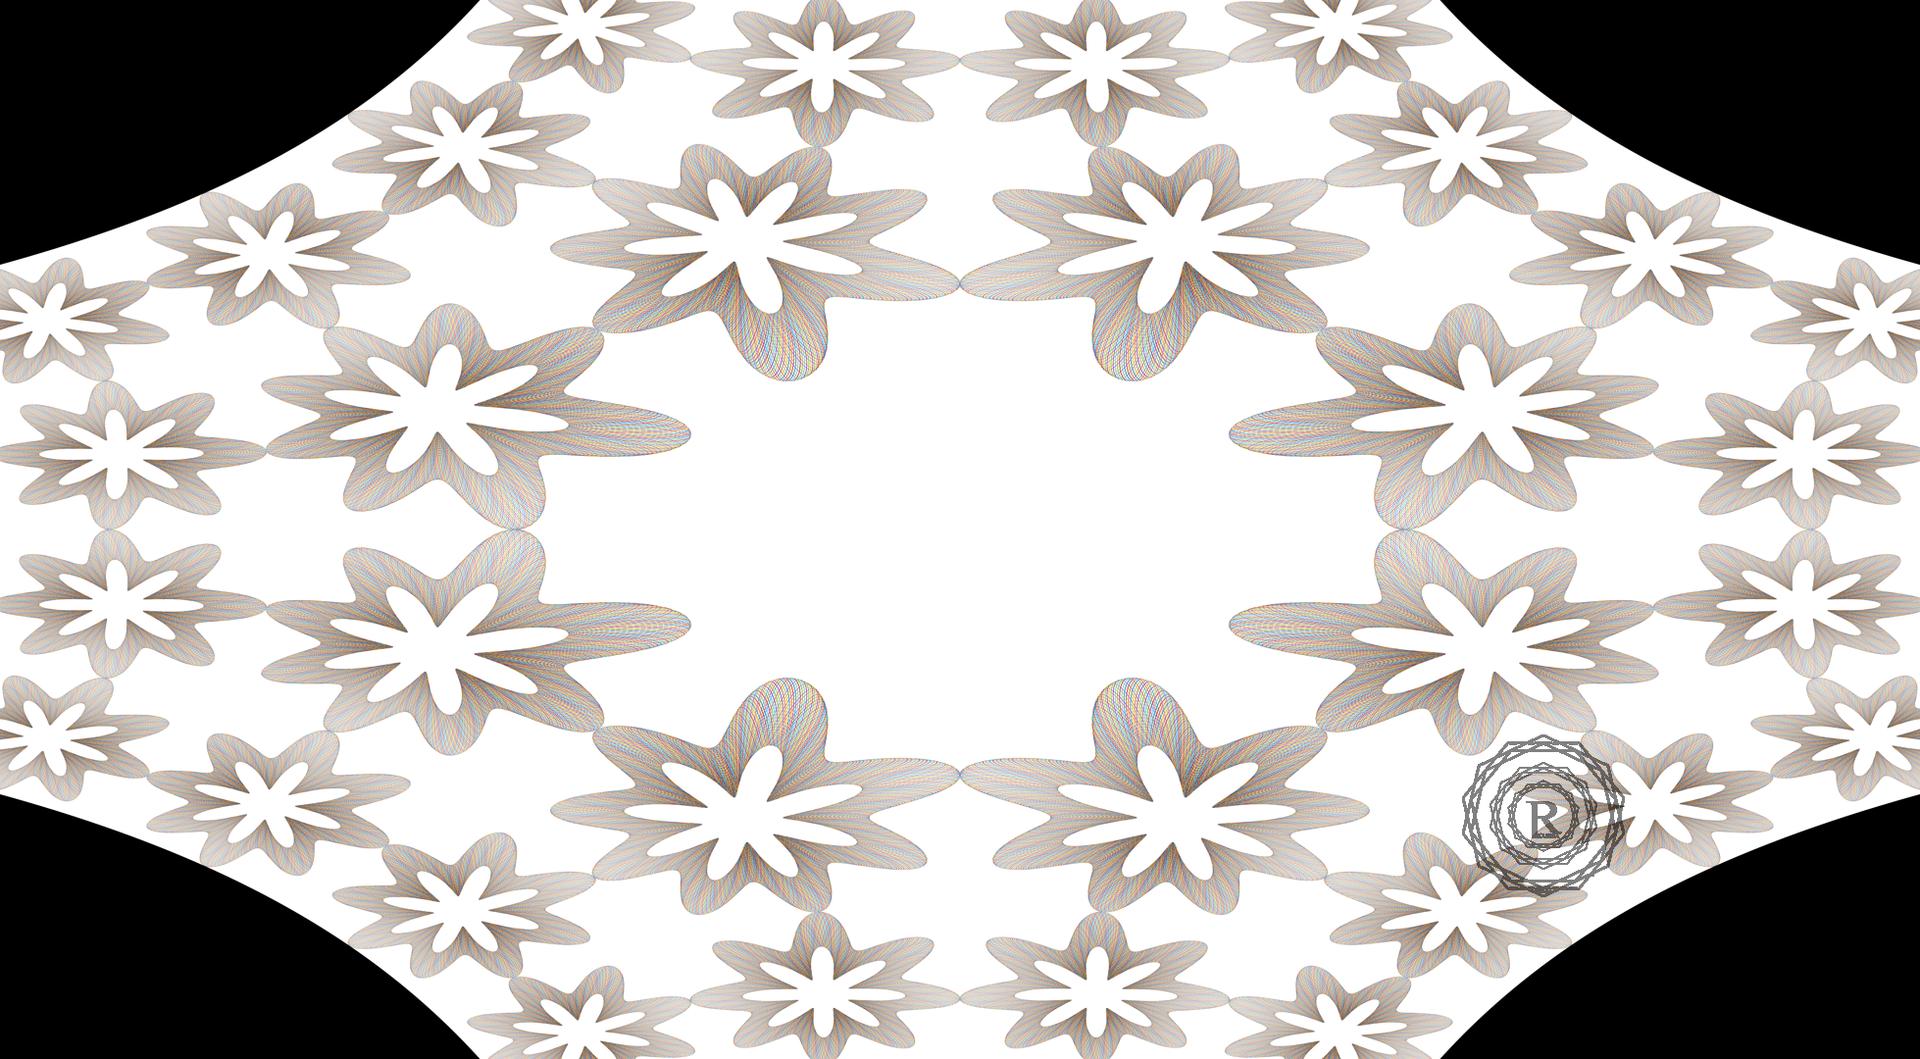 00001Resized_Mandalas_copyright_Recursia